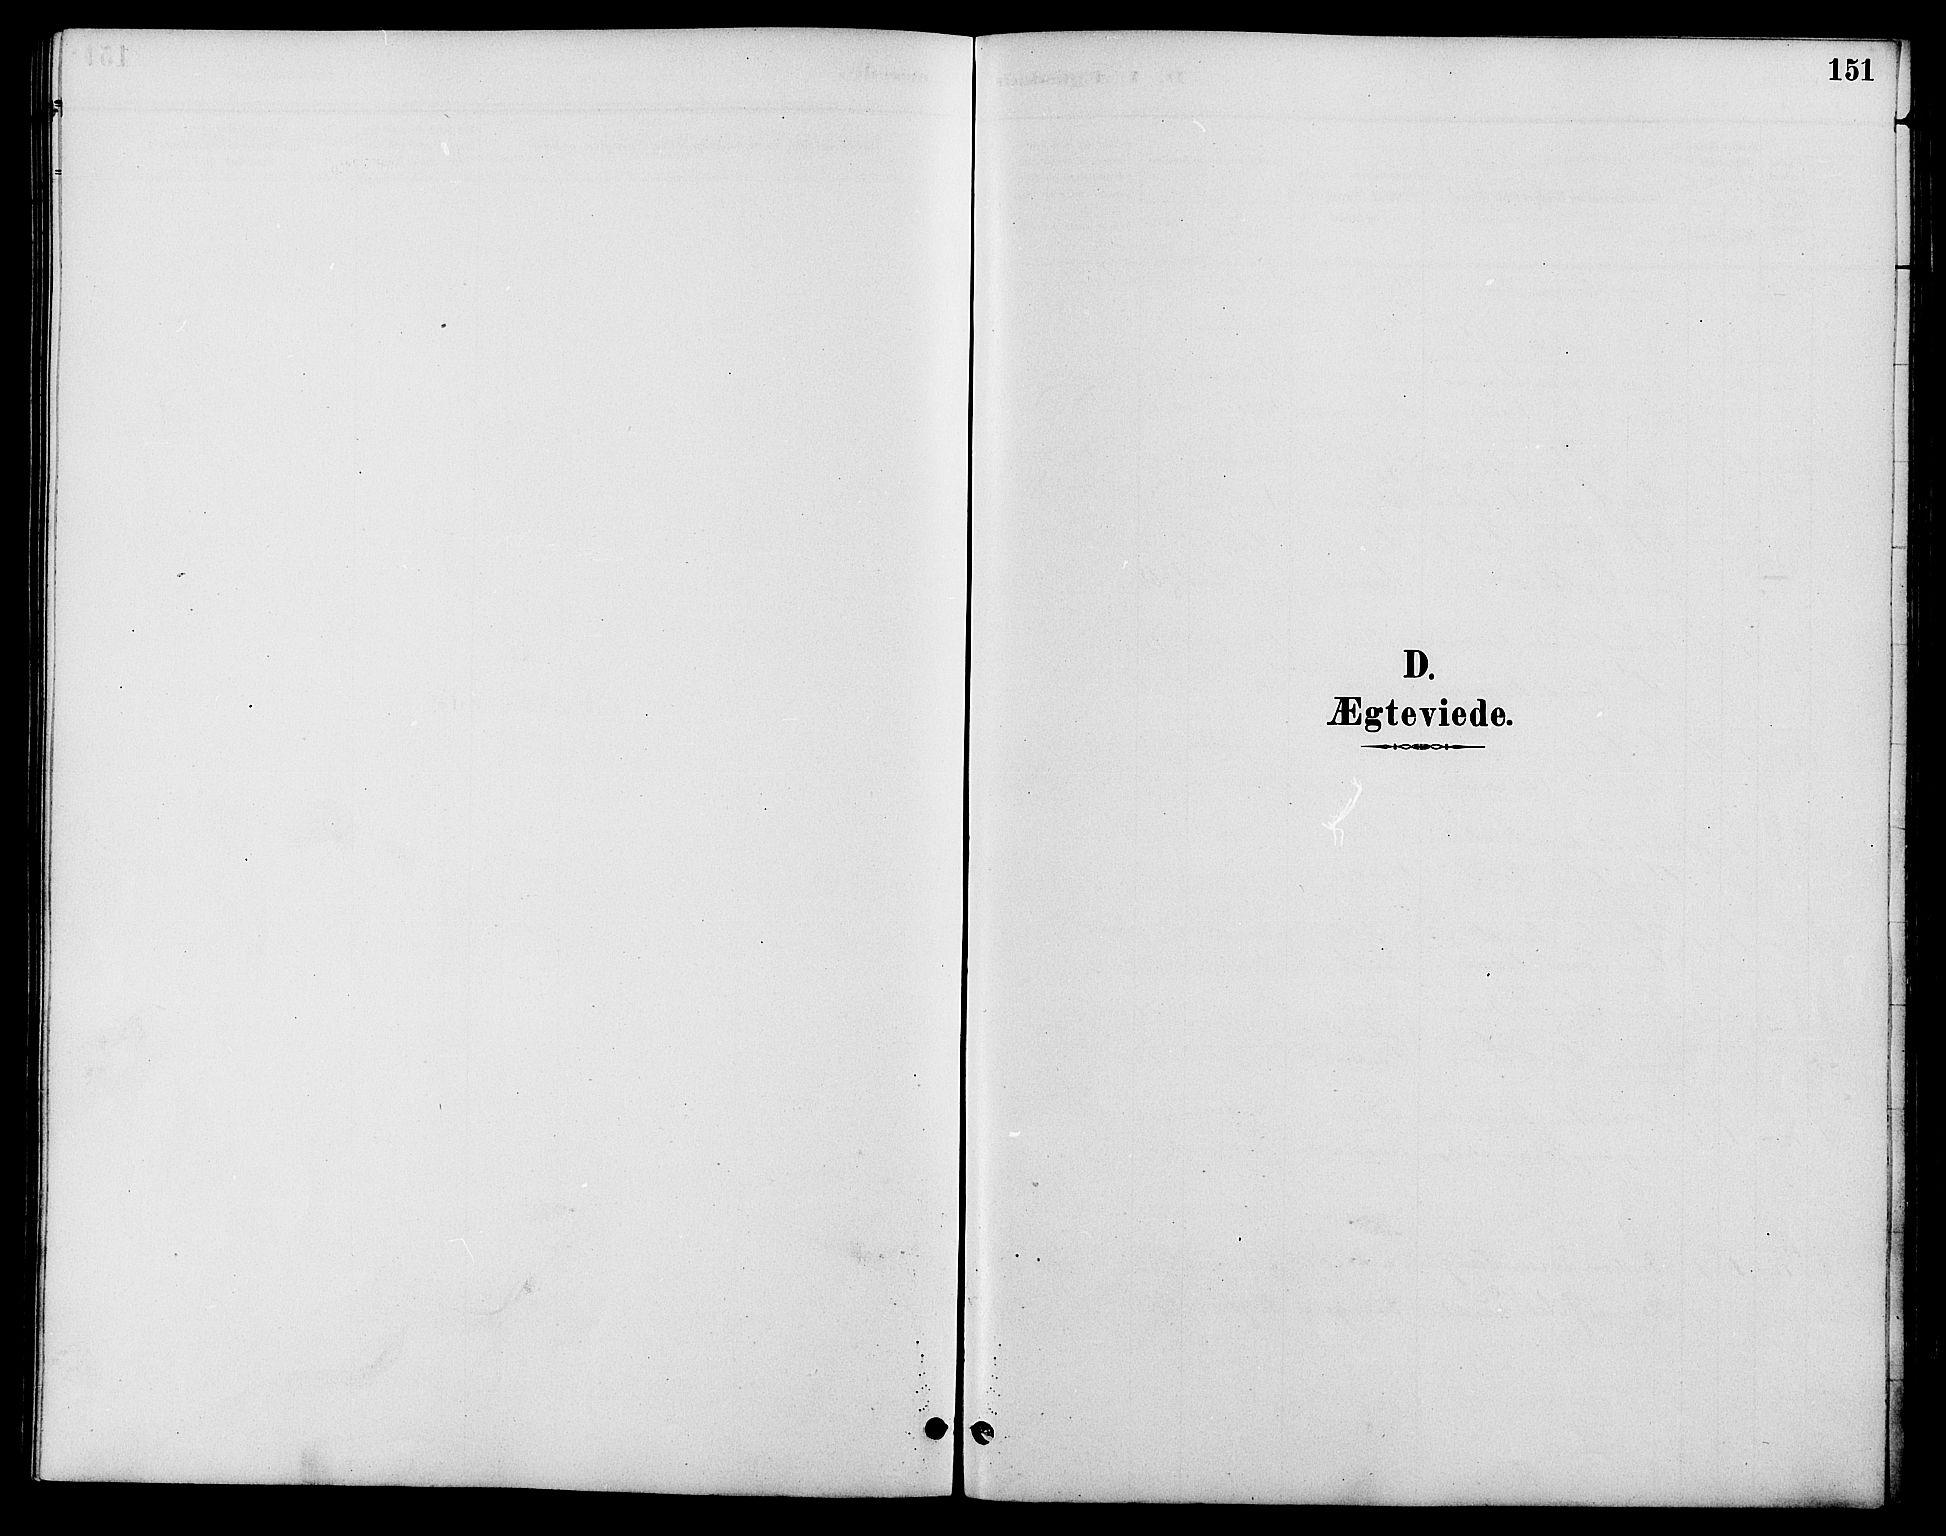 SAH, Nord-Fron prestekontor, Klokkerbok nr. 6, 1887-1914, s. 151